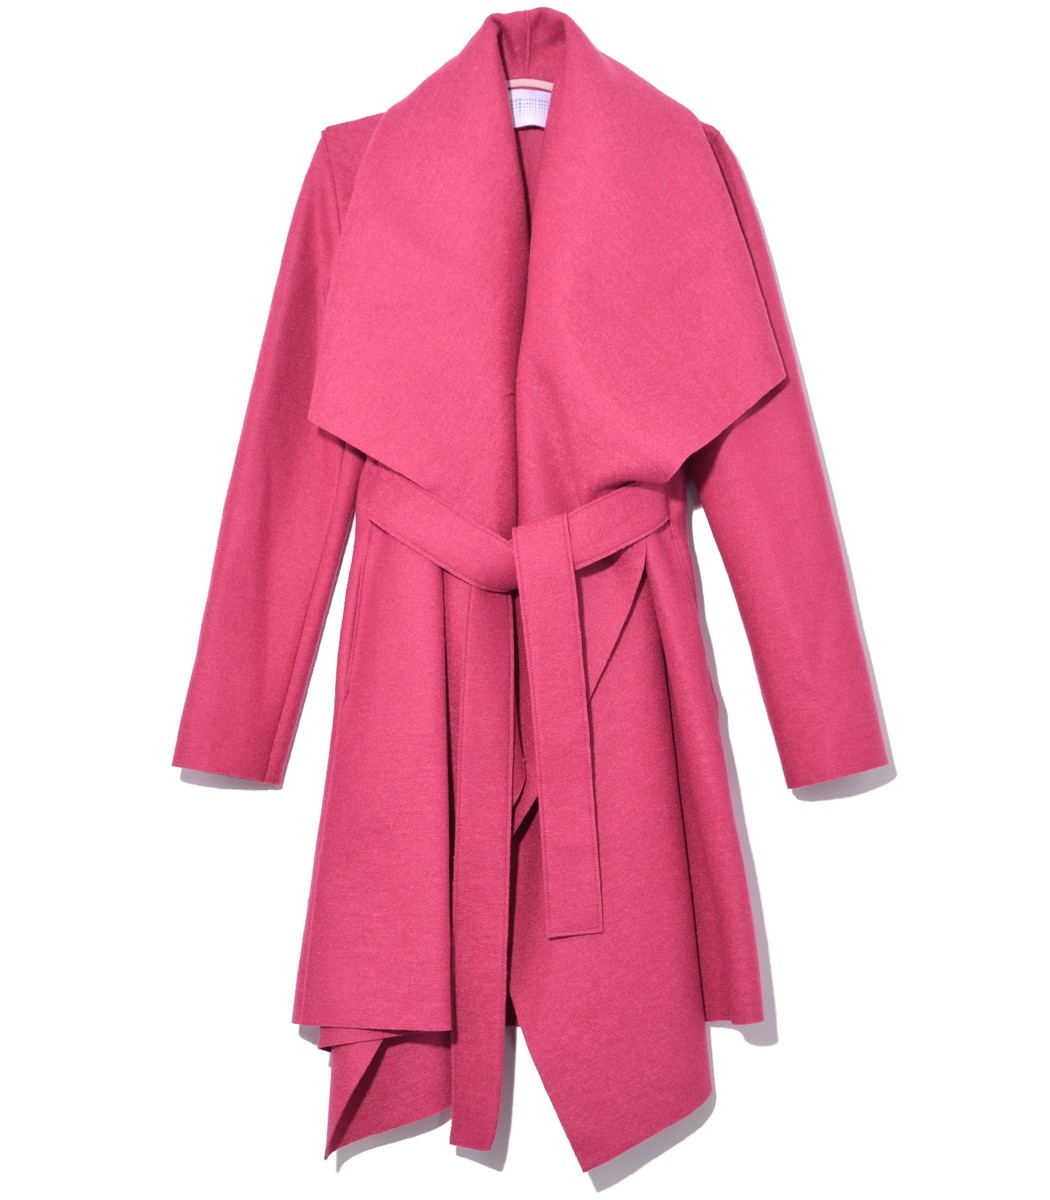 HARRIS WHARF Belted Blanket Coat In Bubble in Bubble Pink